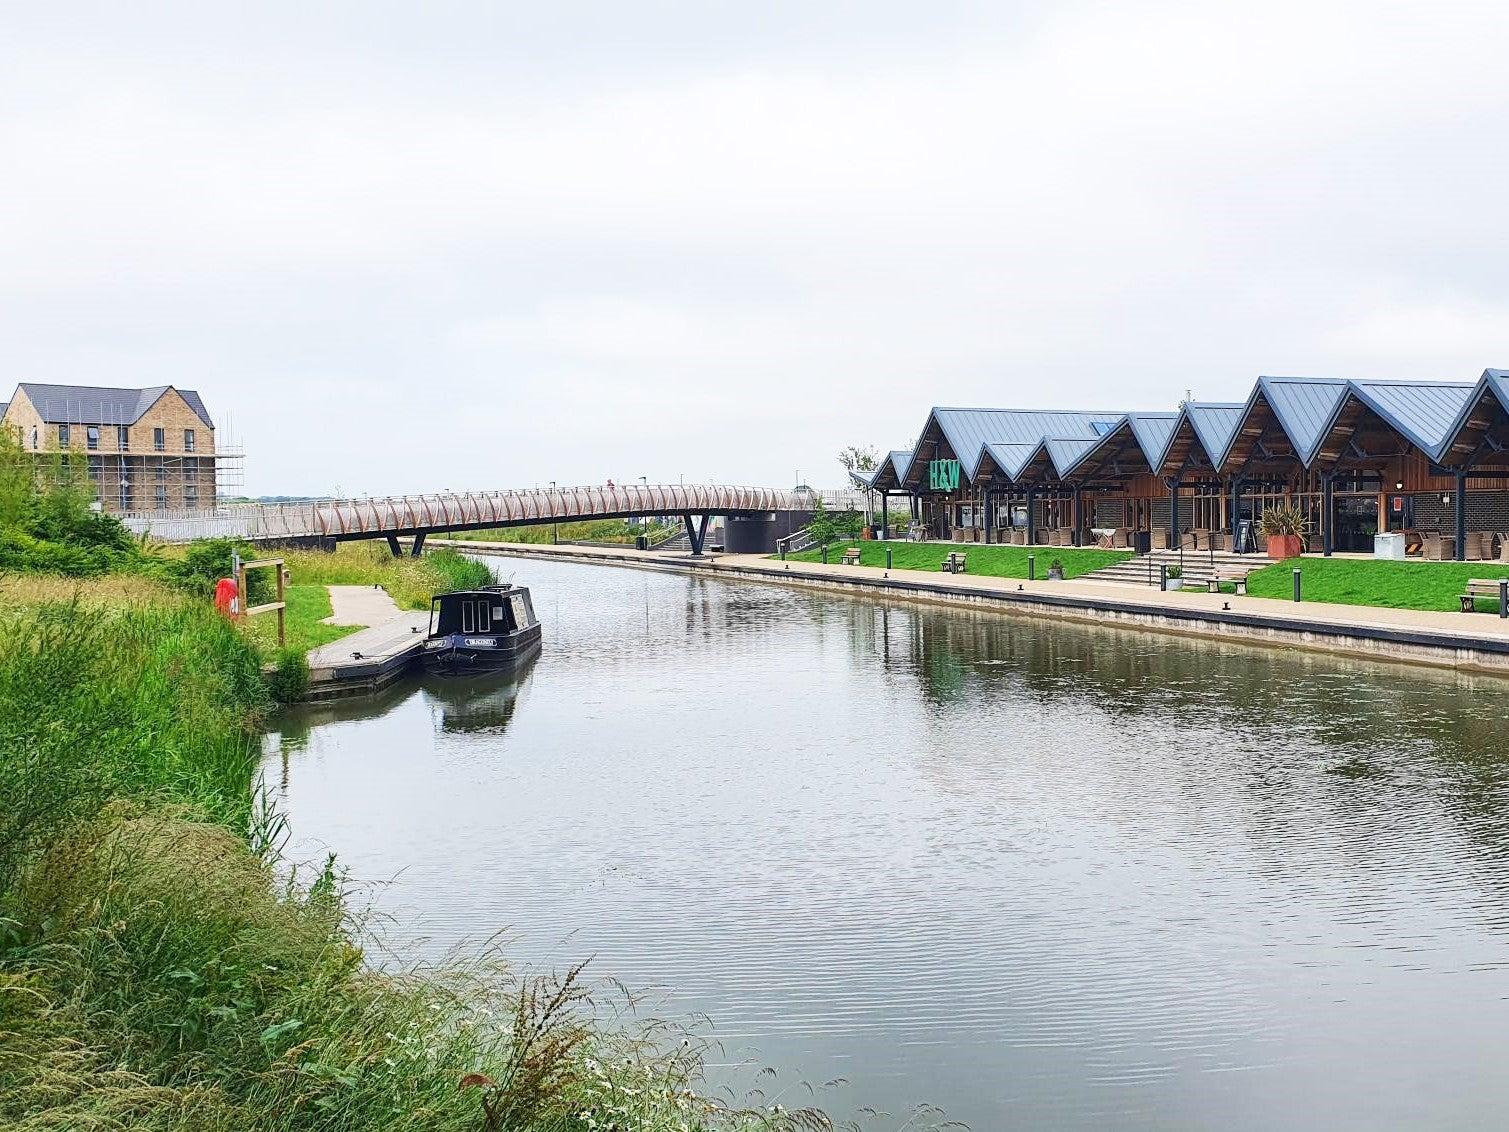 Canalside development location